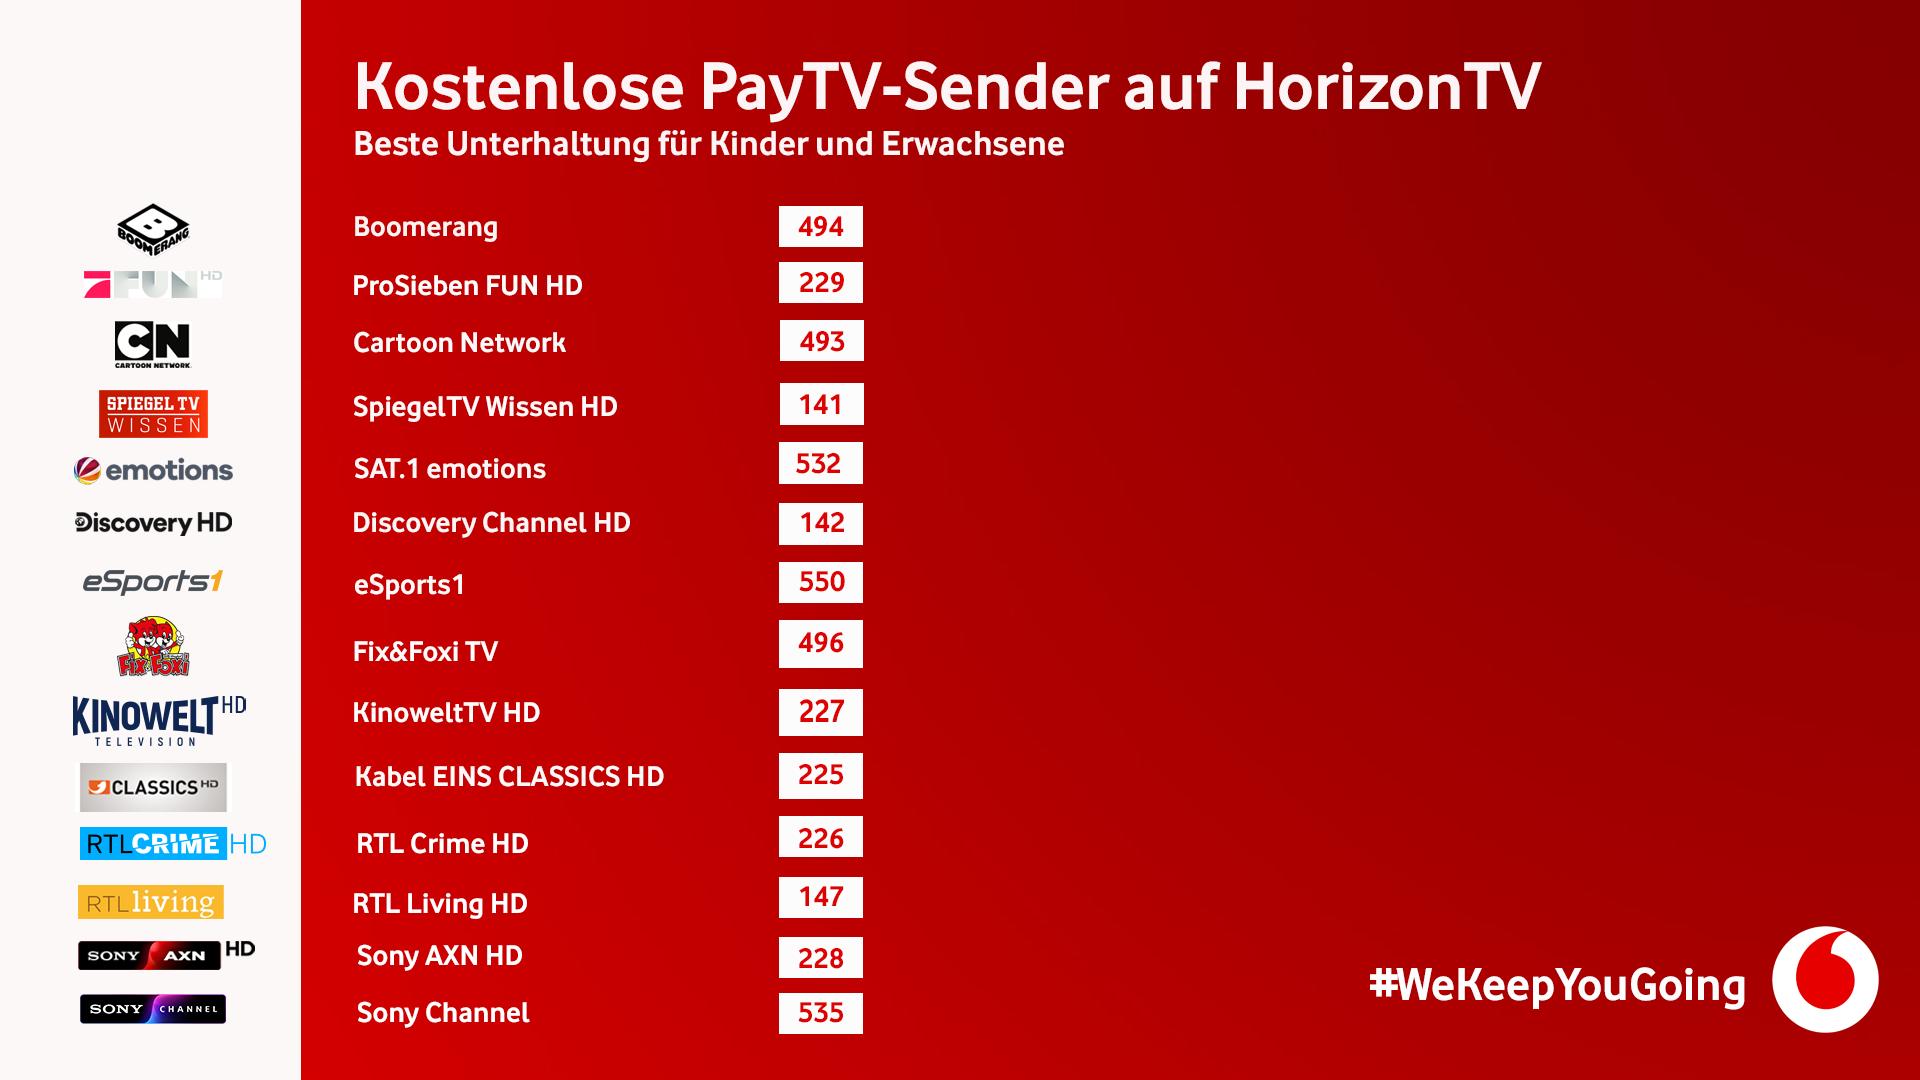 Kostenlose PayTV Sender auf HorizonTV